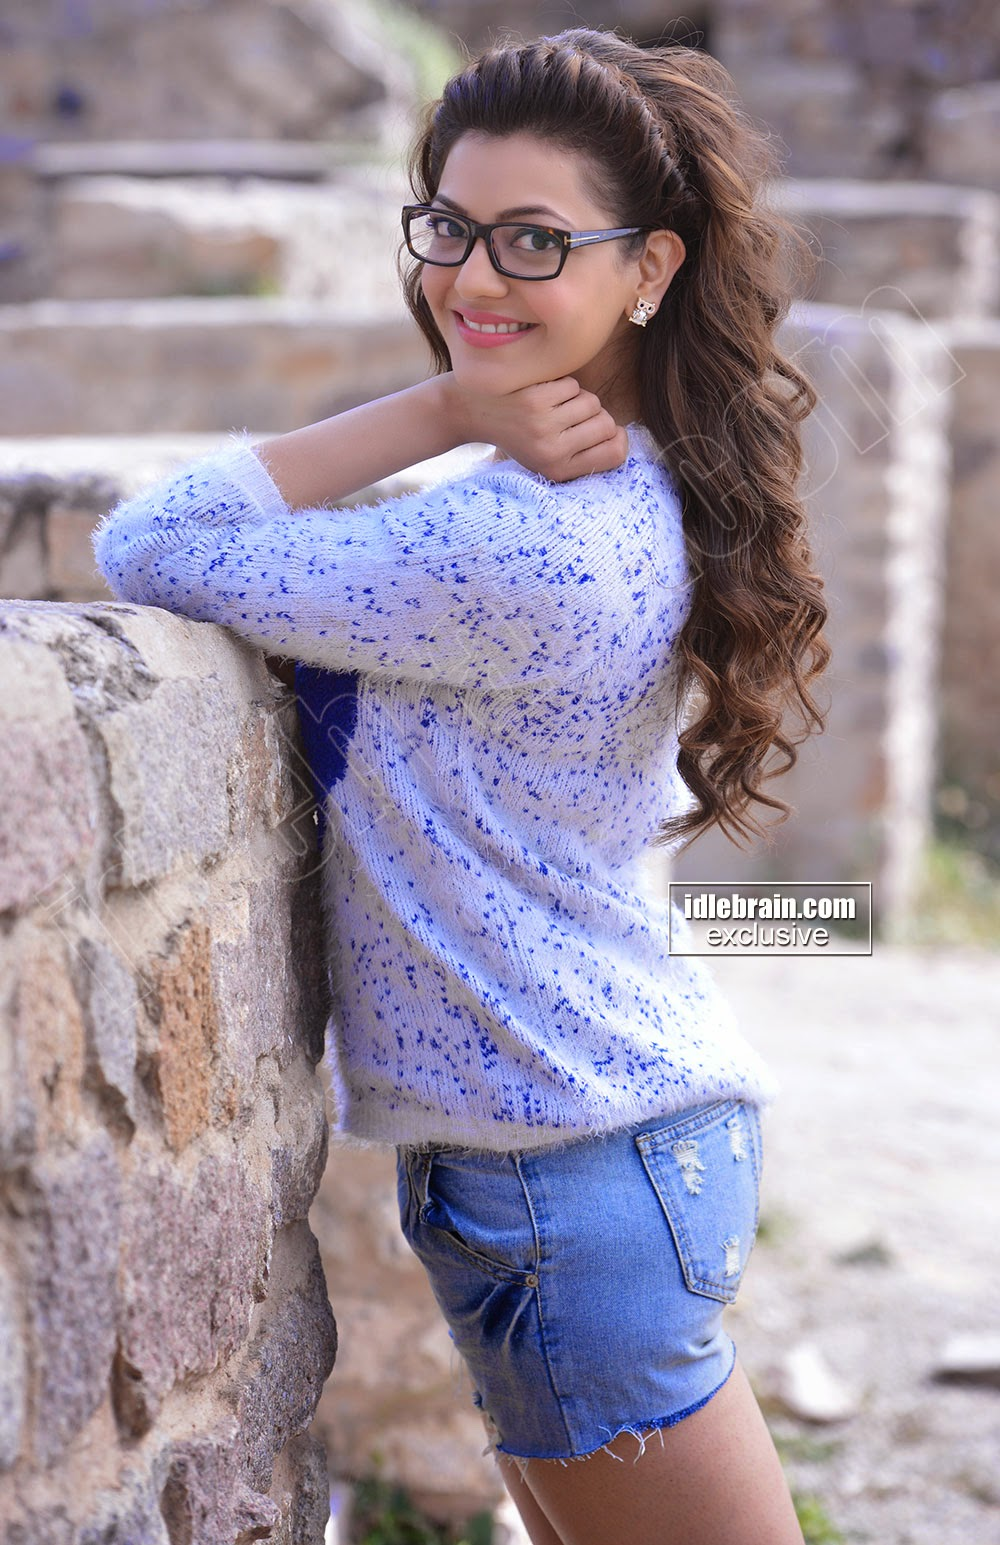 Kajal Agarwal in Tiny Jeans Short Hot Images - Hot & Sexy Bikini ...